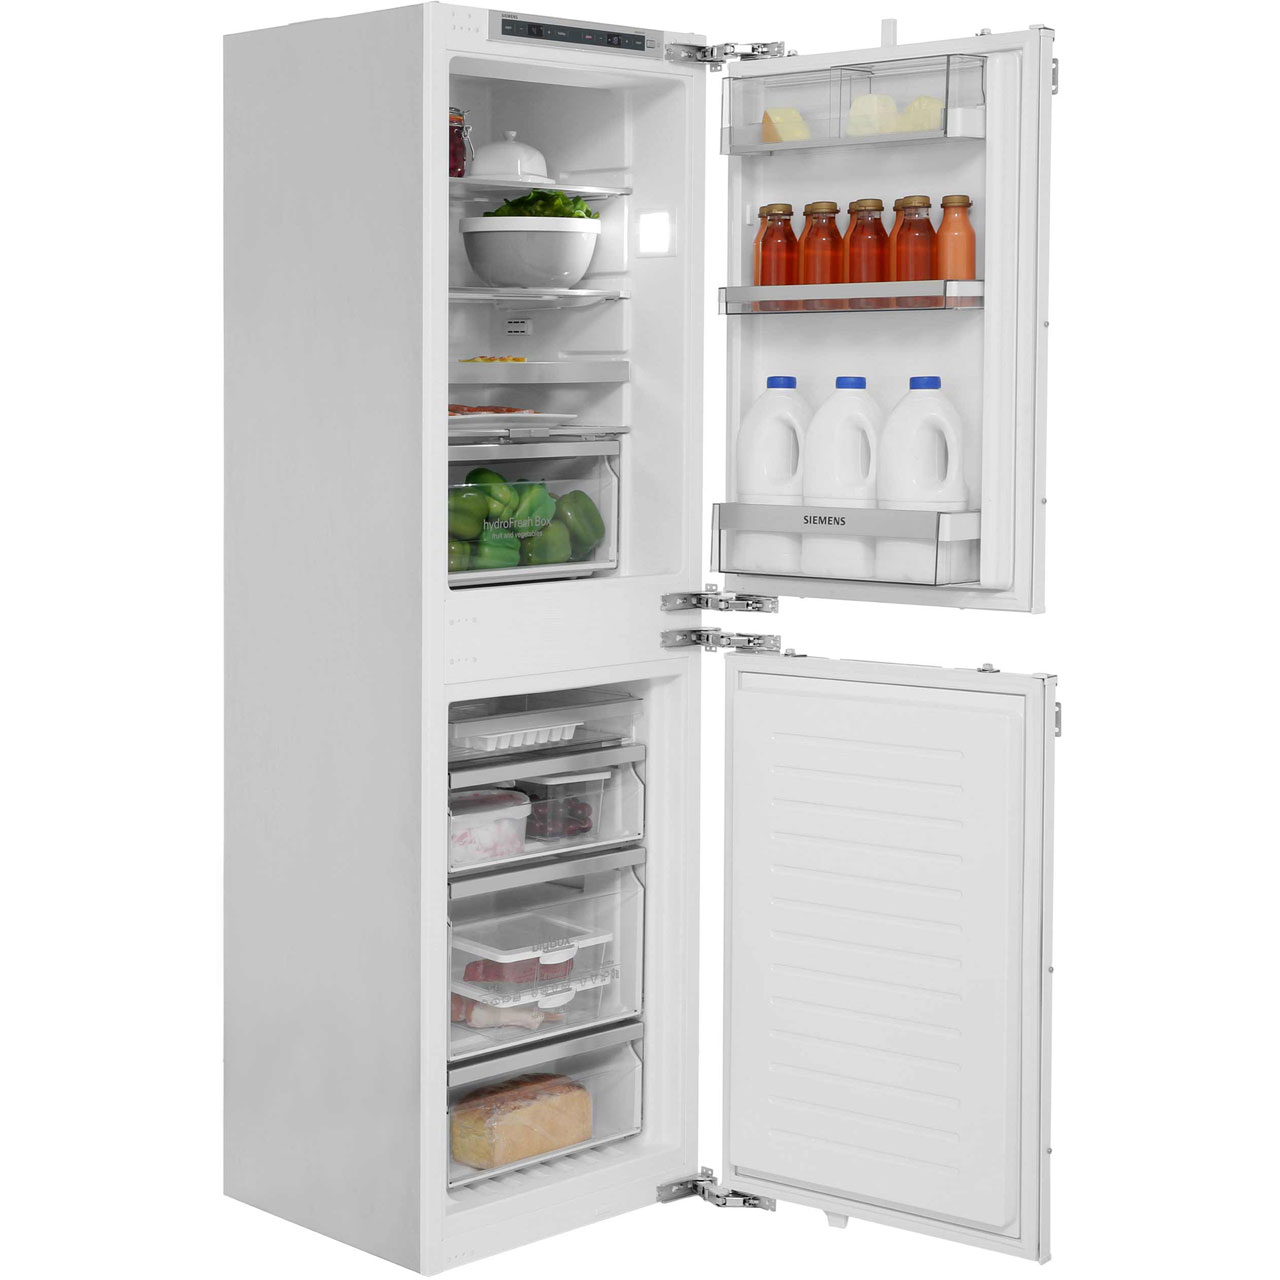 Wonderful Siemens Integrated Fridge Freezer | K185NAD30G | Ao.com Design